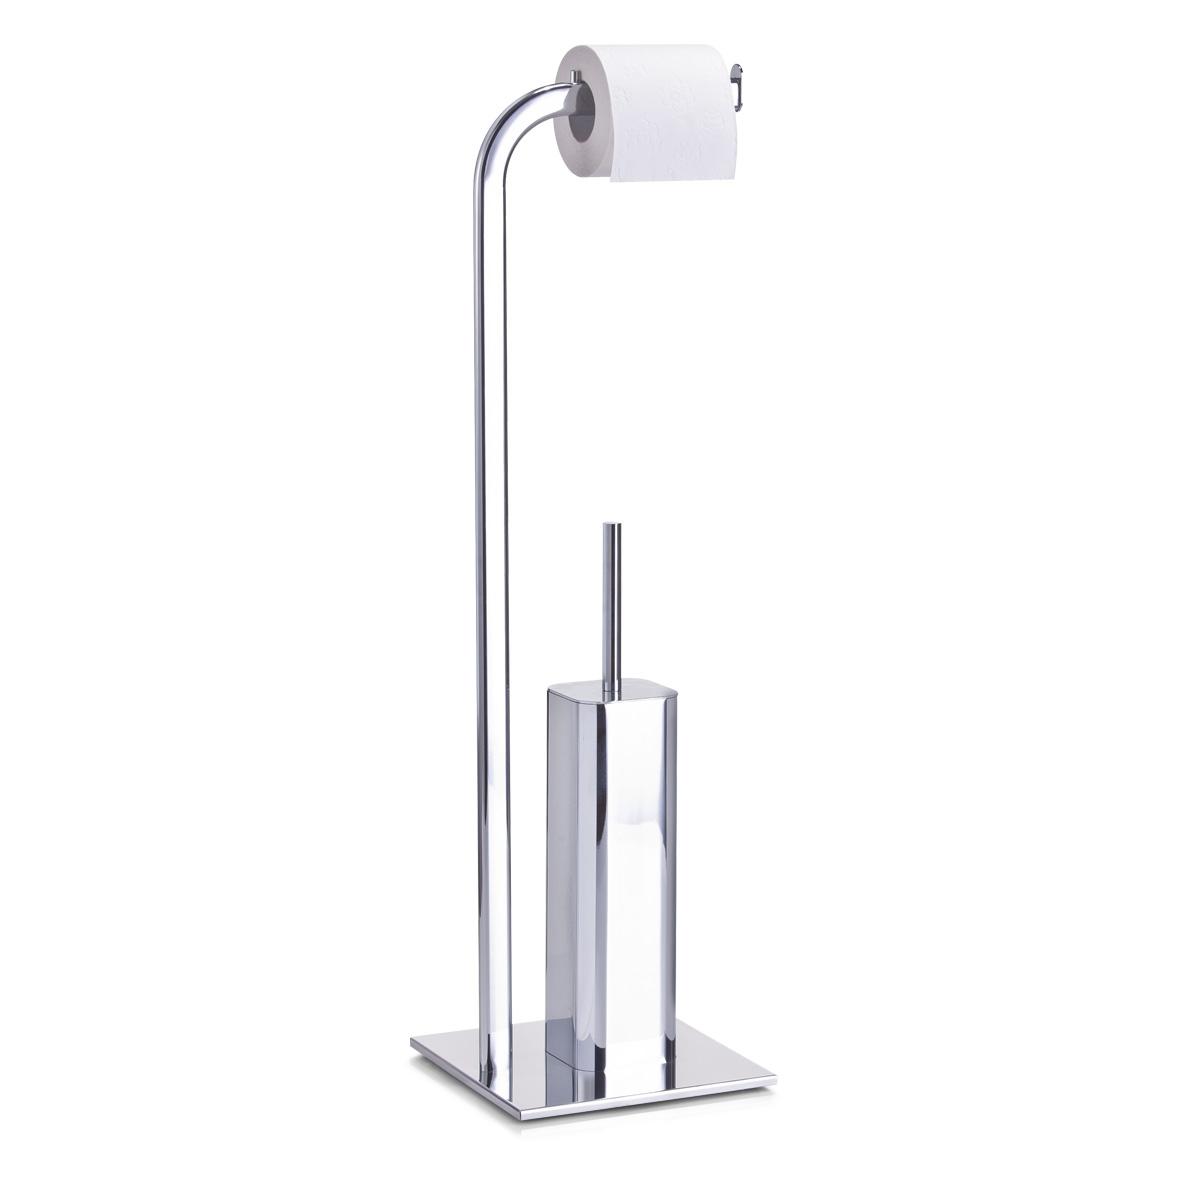 Suport pentru hartie igienica si perie de toaleta, Steel Metal cromat, l20xA20xH72 cm imagine